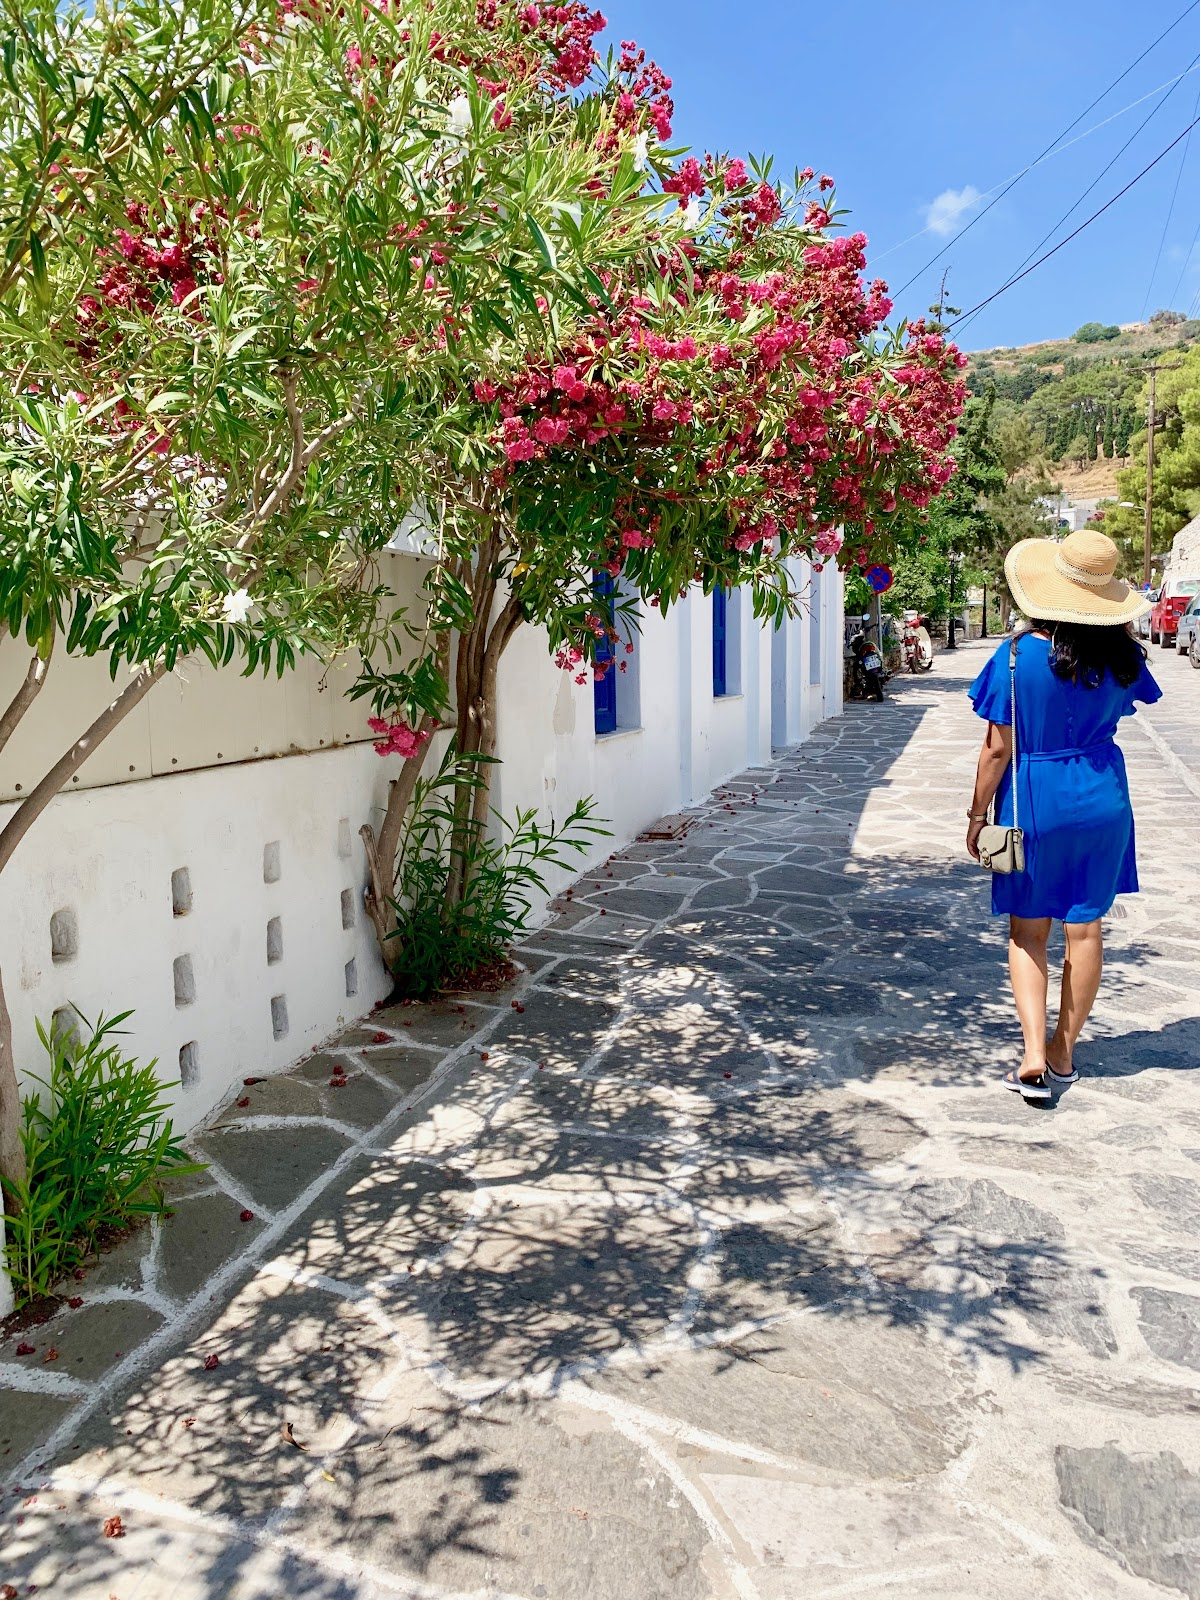 Lefkes Paros - things to do; 2 days in Paros